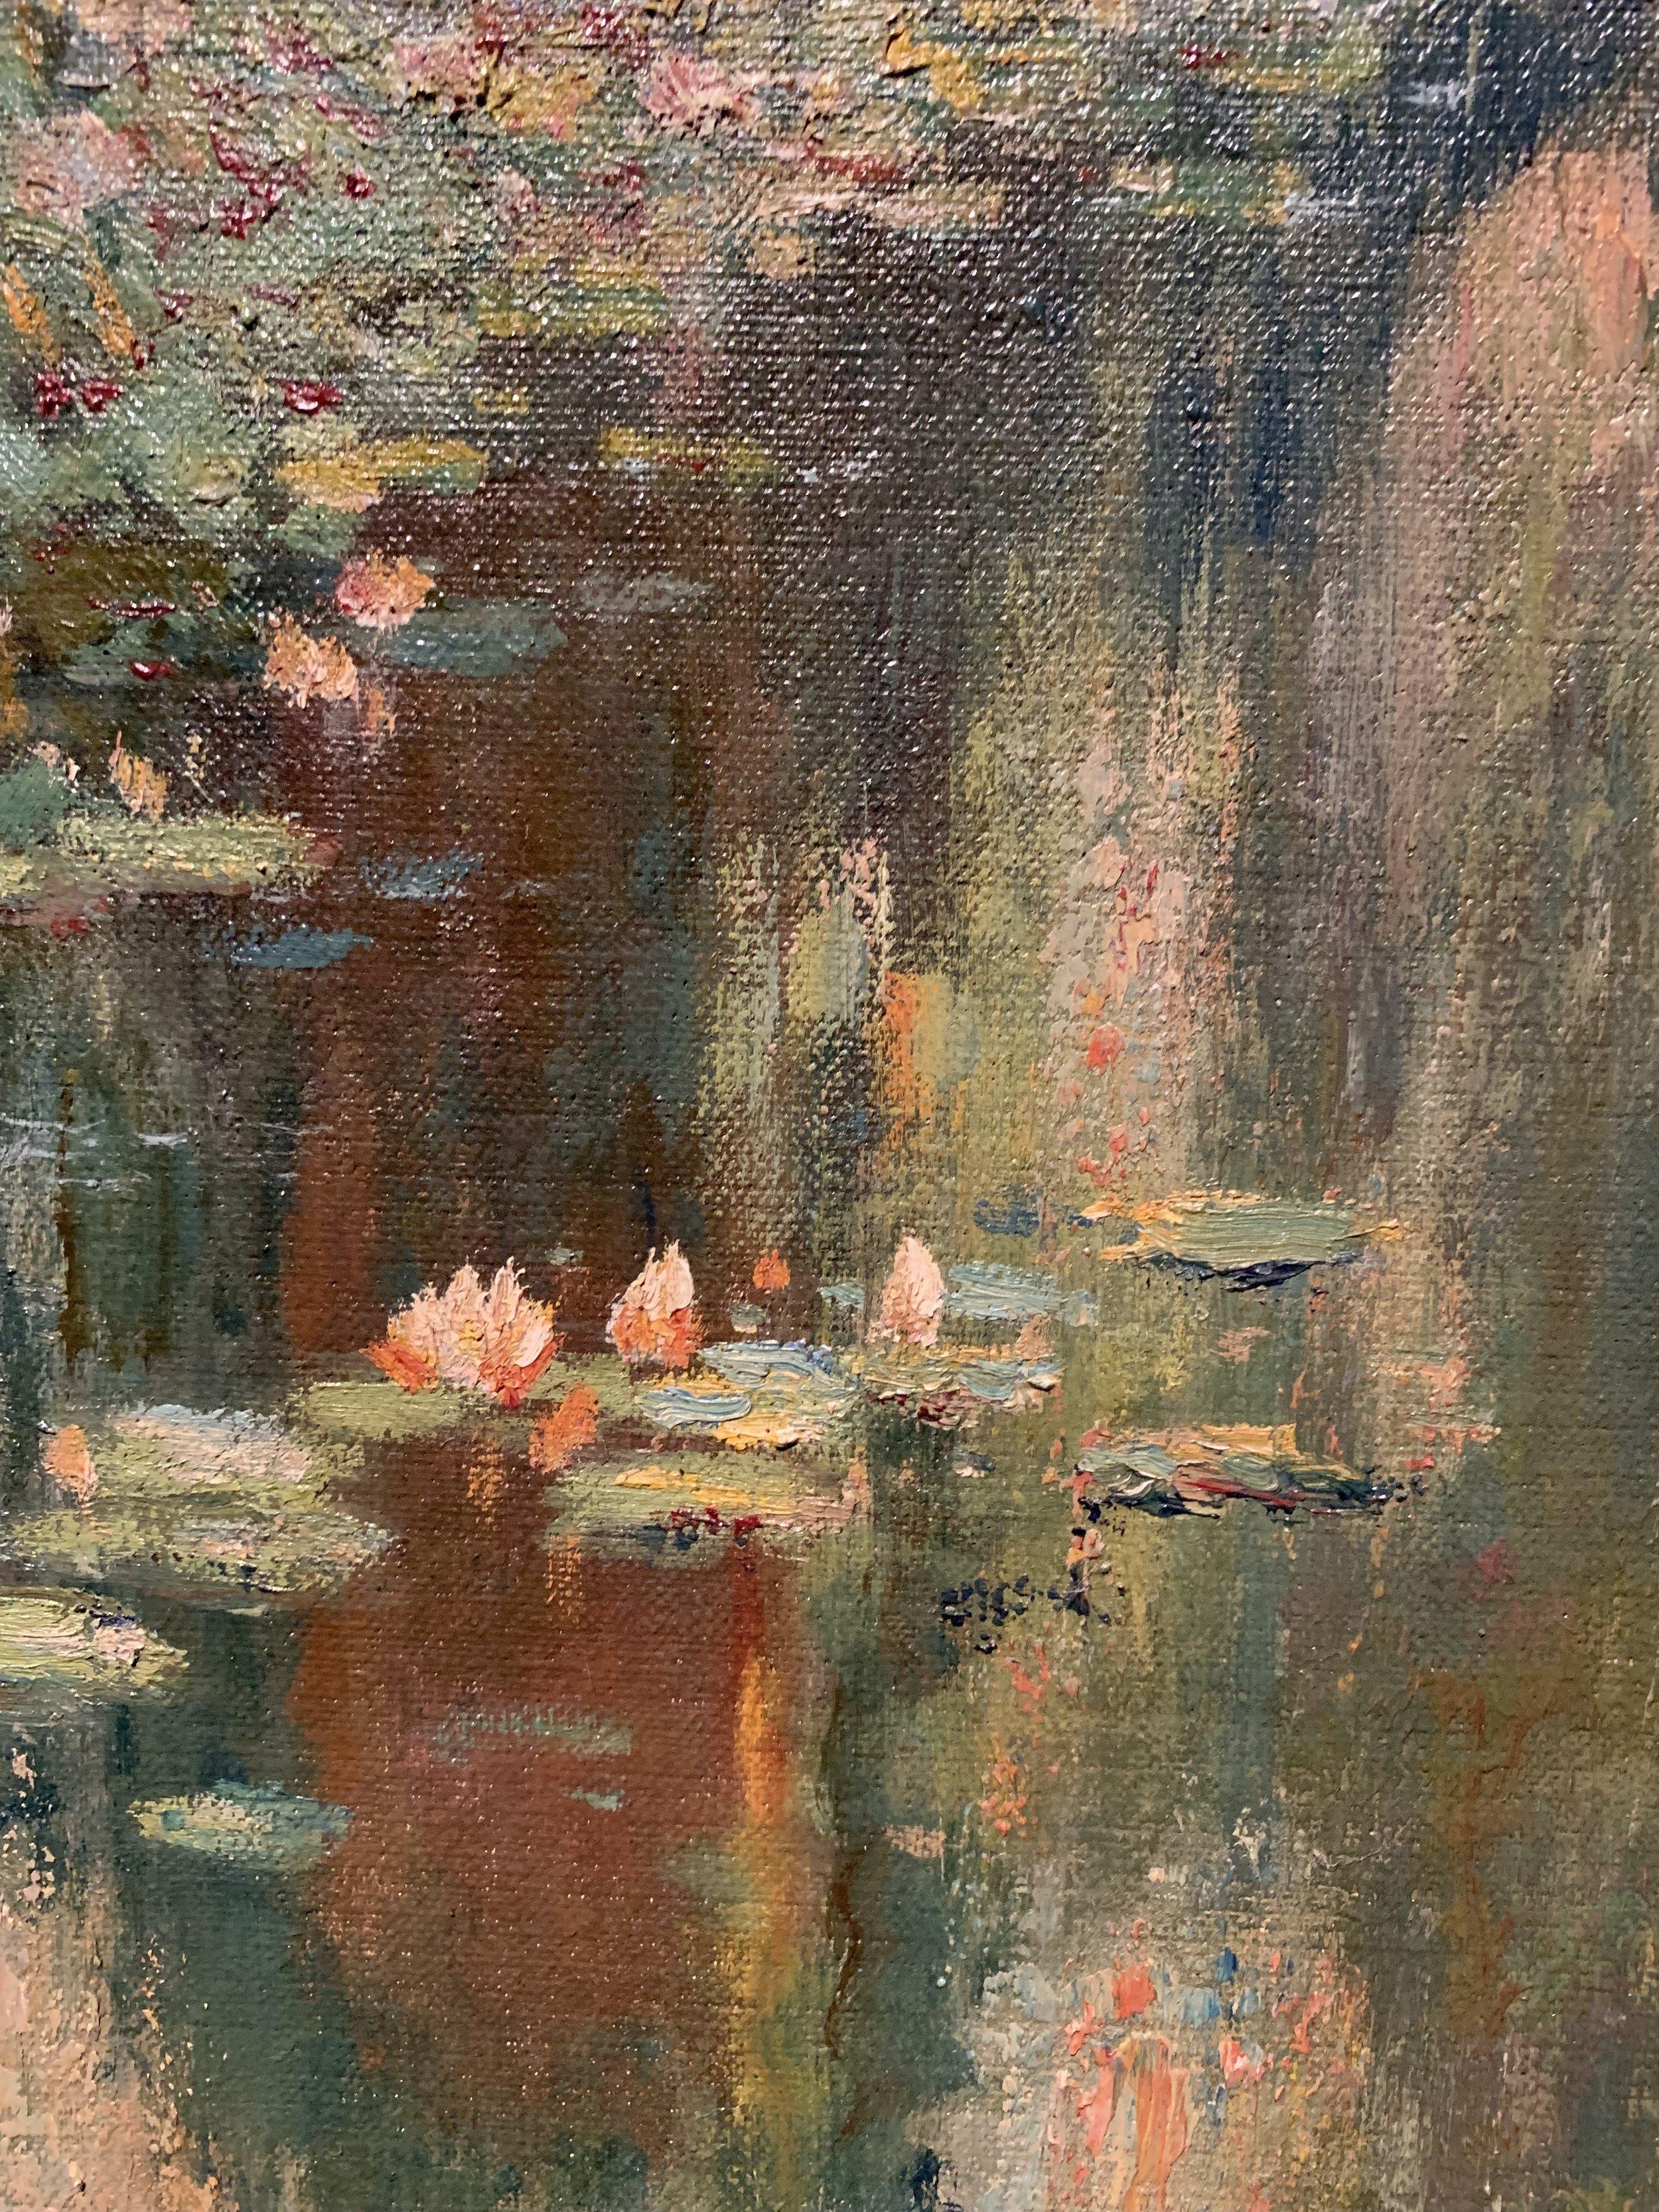 The Lotus Pool, El Encanto, Santa Barbara (detail)